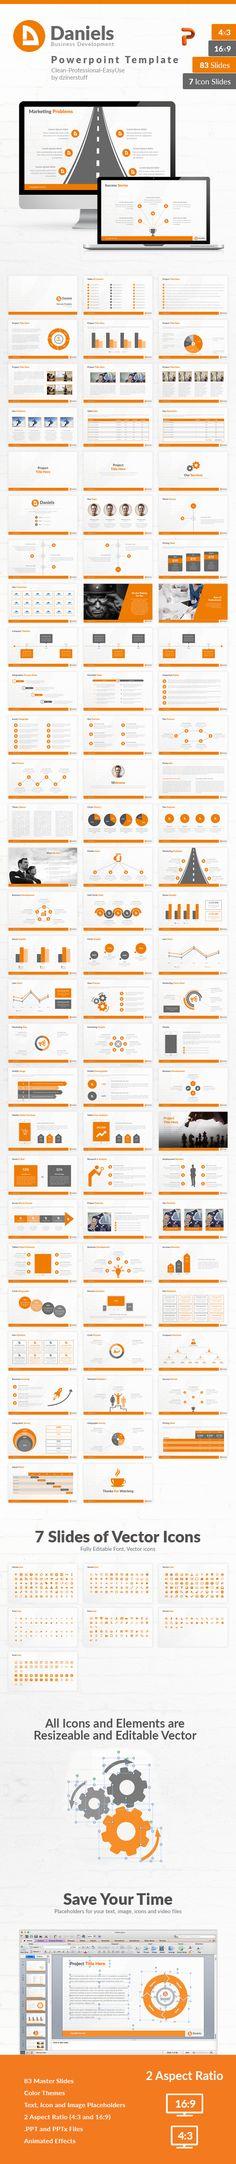 Daniels Powerpoint Presentation Template - Business PowerPoint Templates